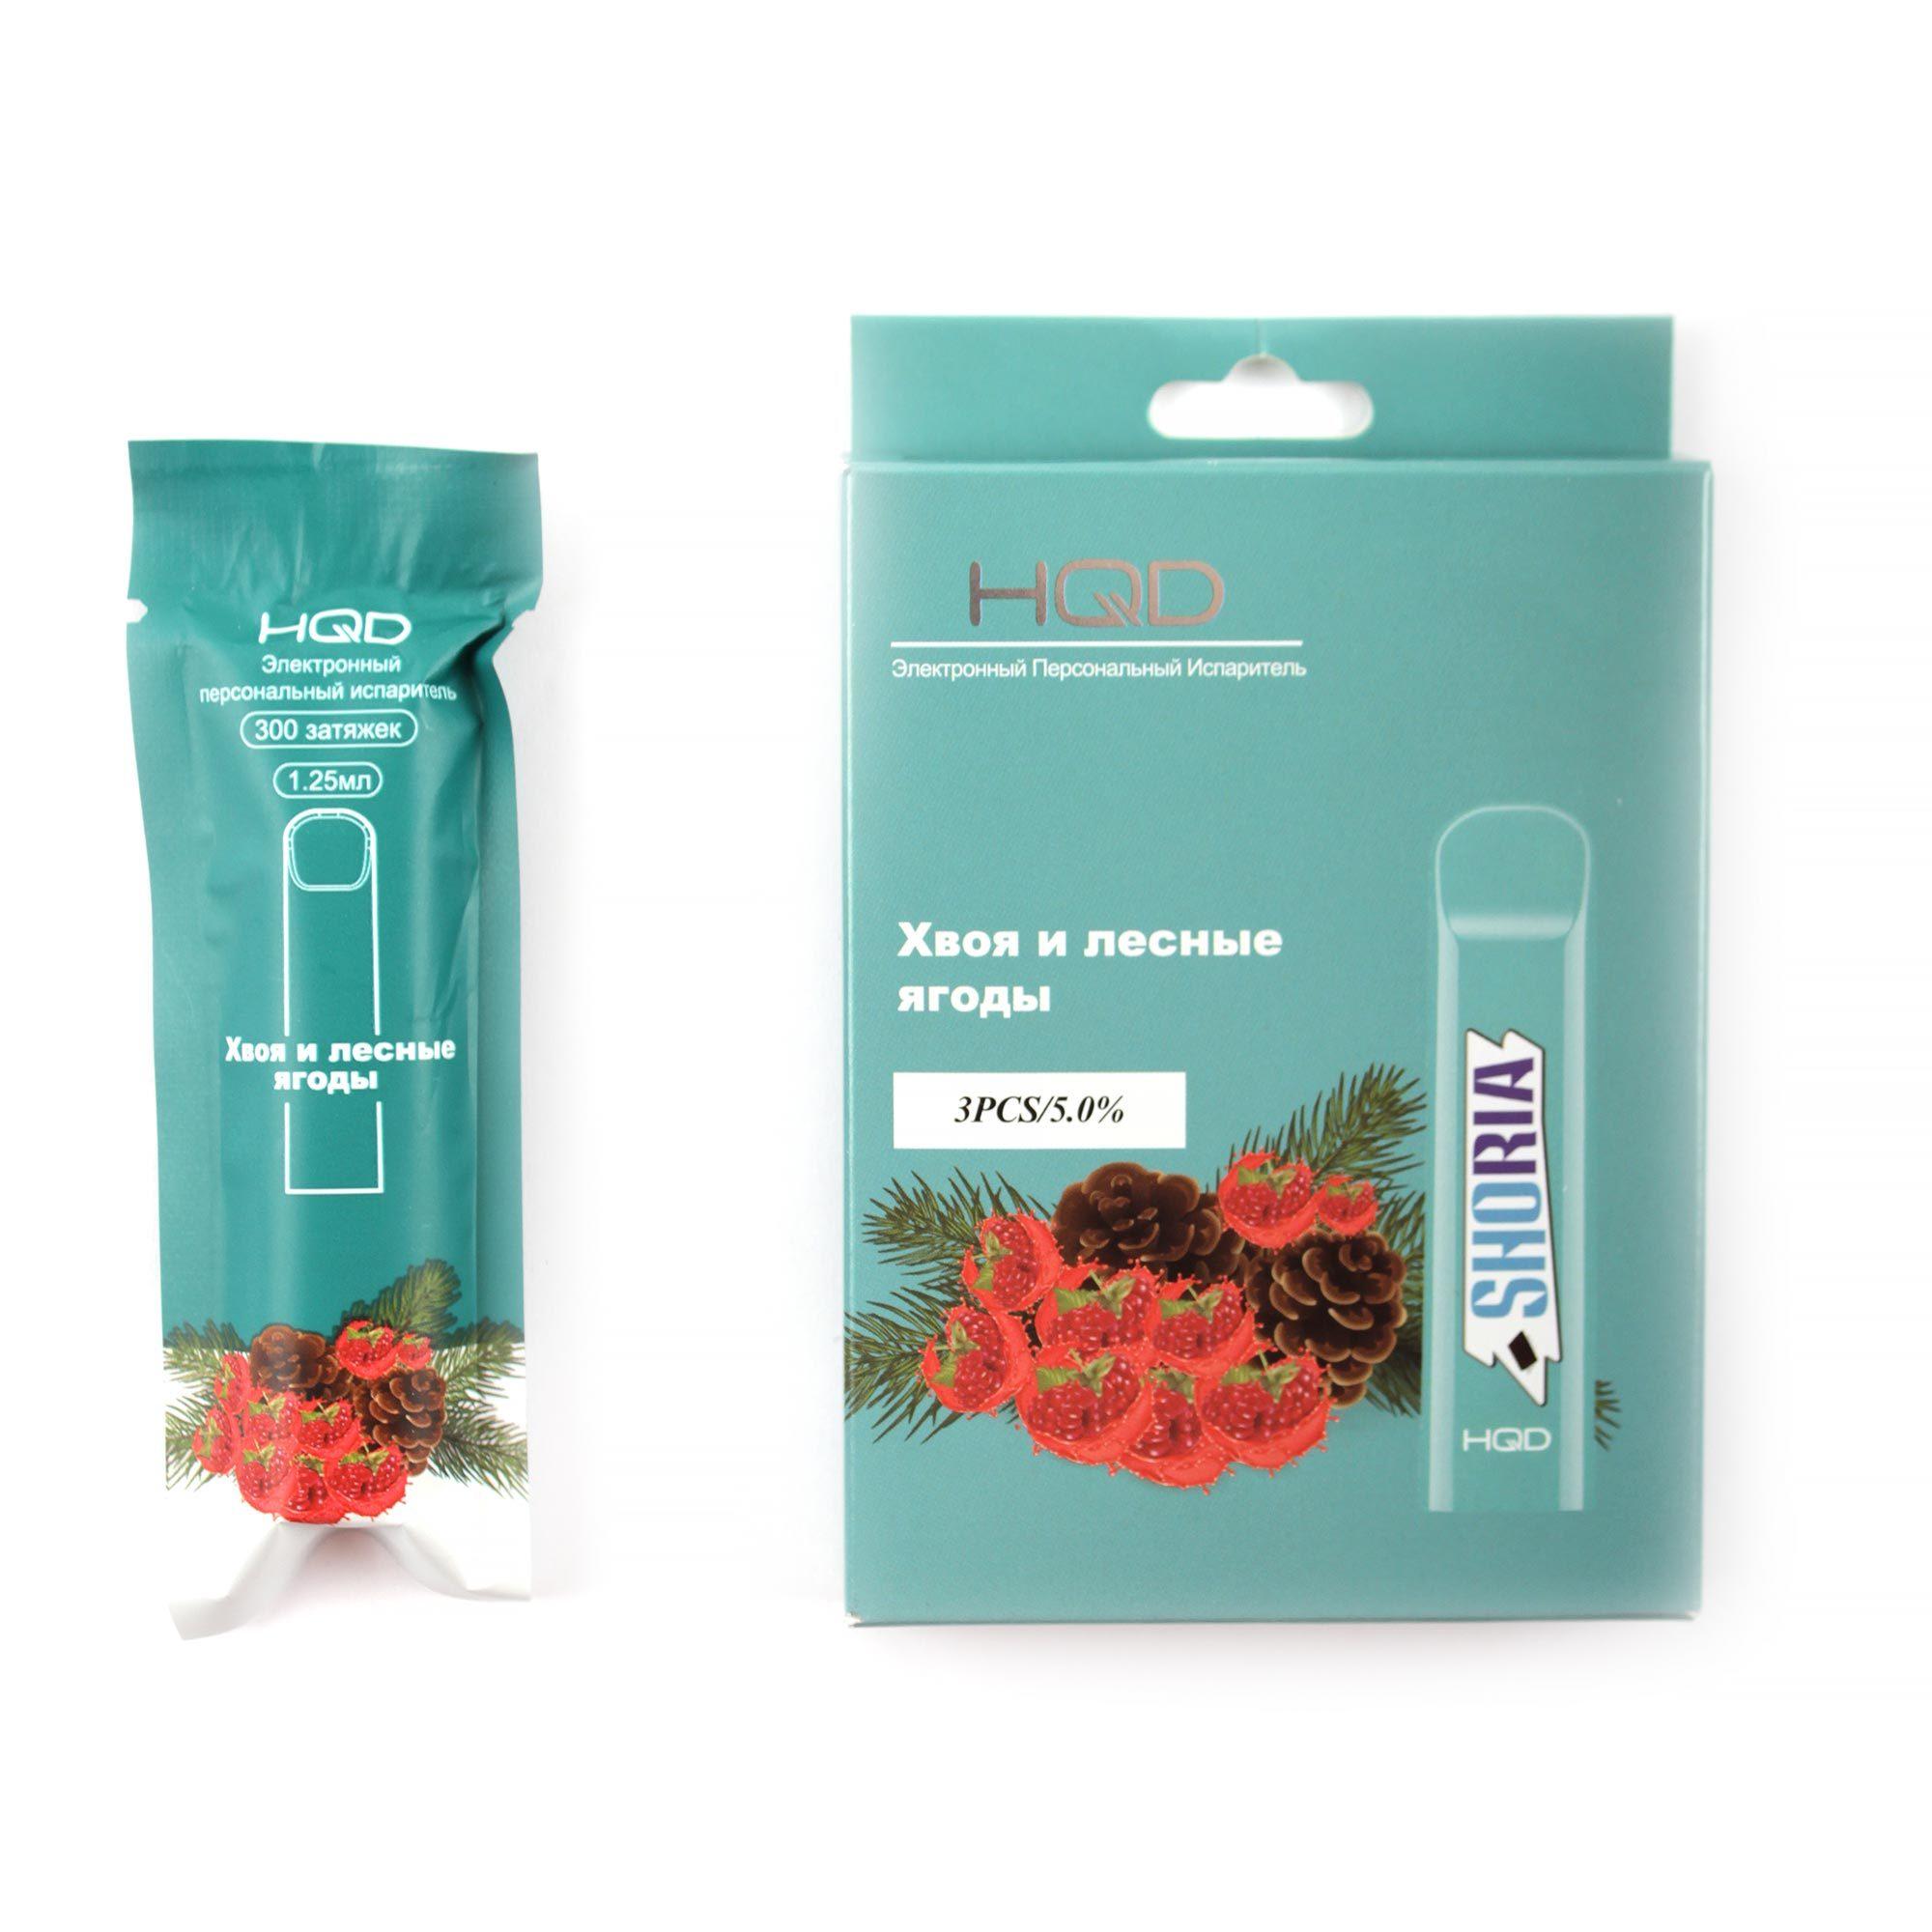 Одноразовая электронная сигарета HQD Shoria (Мята, Хвоя, Лесные Ягоды)